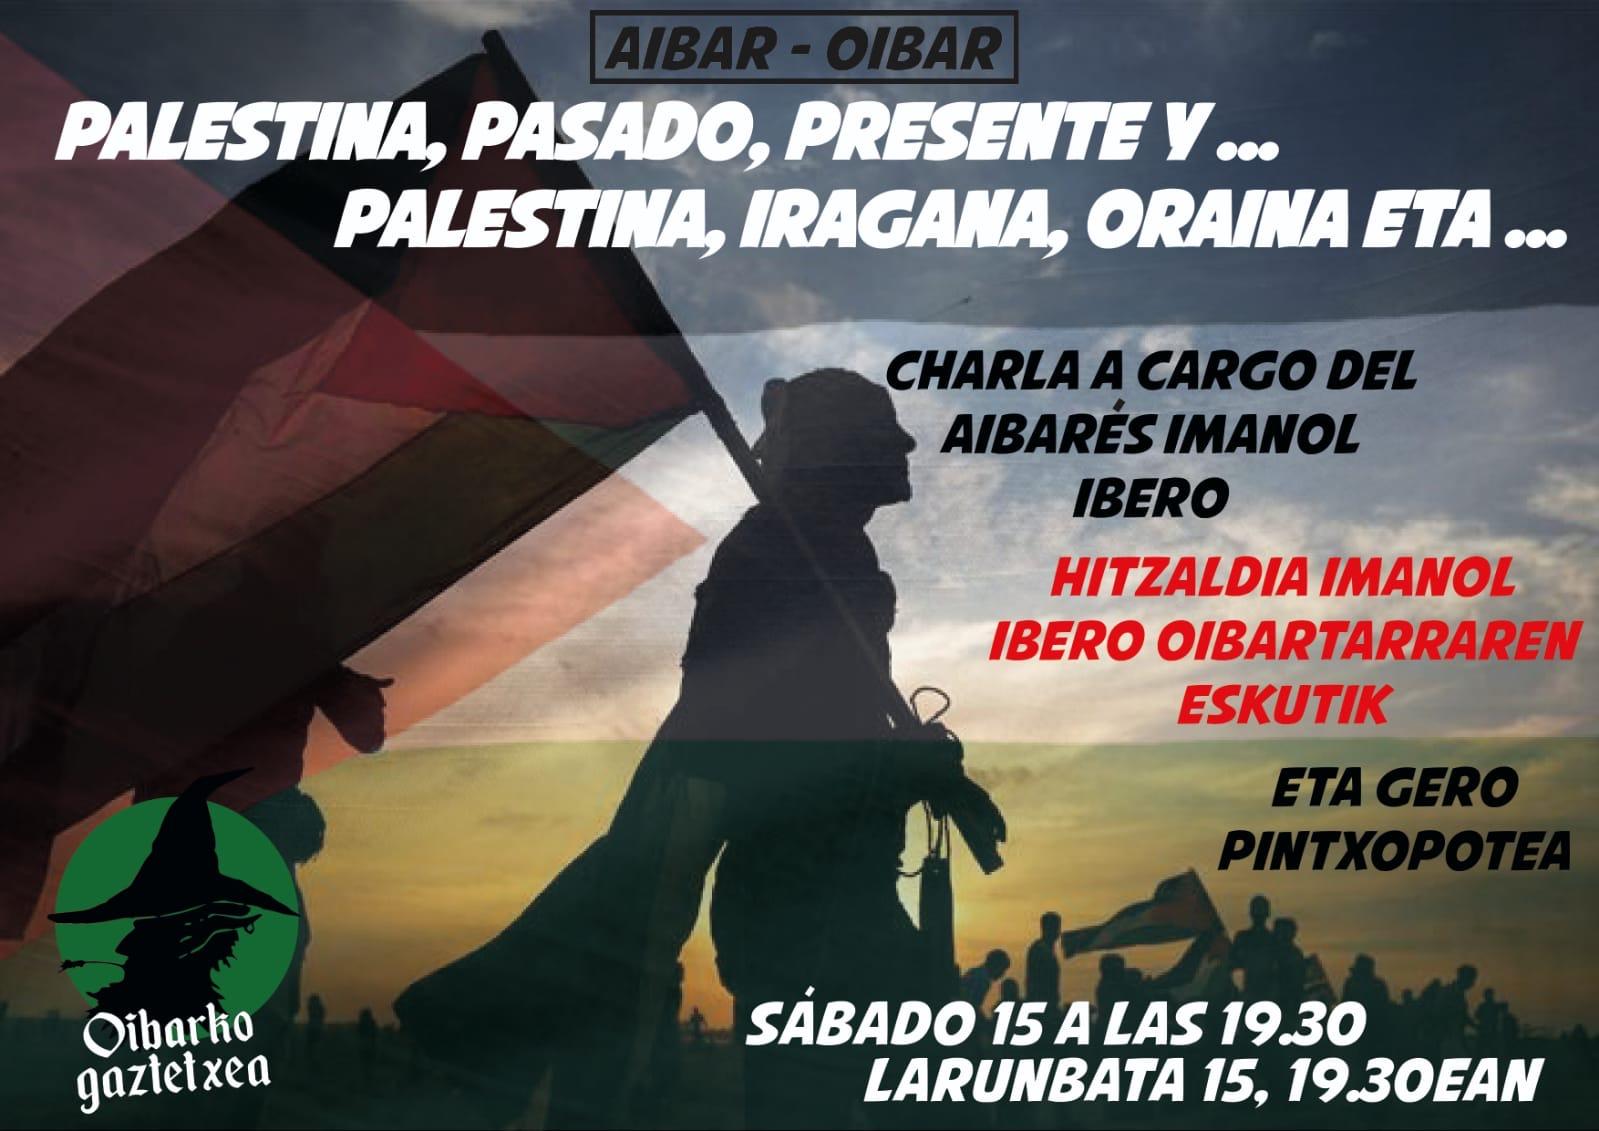 "Charla: ""Palestina. Pasado, presente y ..."" de la mano de Imanol Ibero Azkarate / Hitzaldia: ""Palestina. Iragana, oraina eta..."" Imanol Iberoren eskutik"